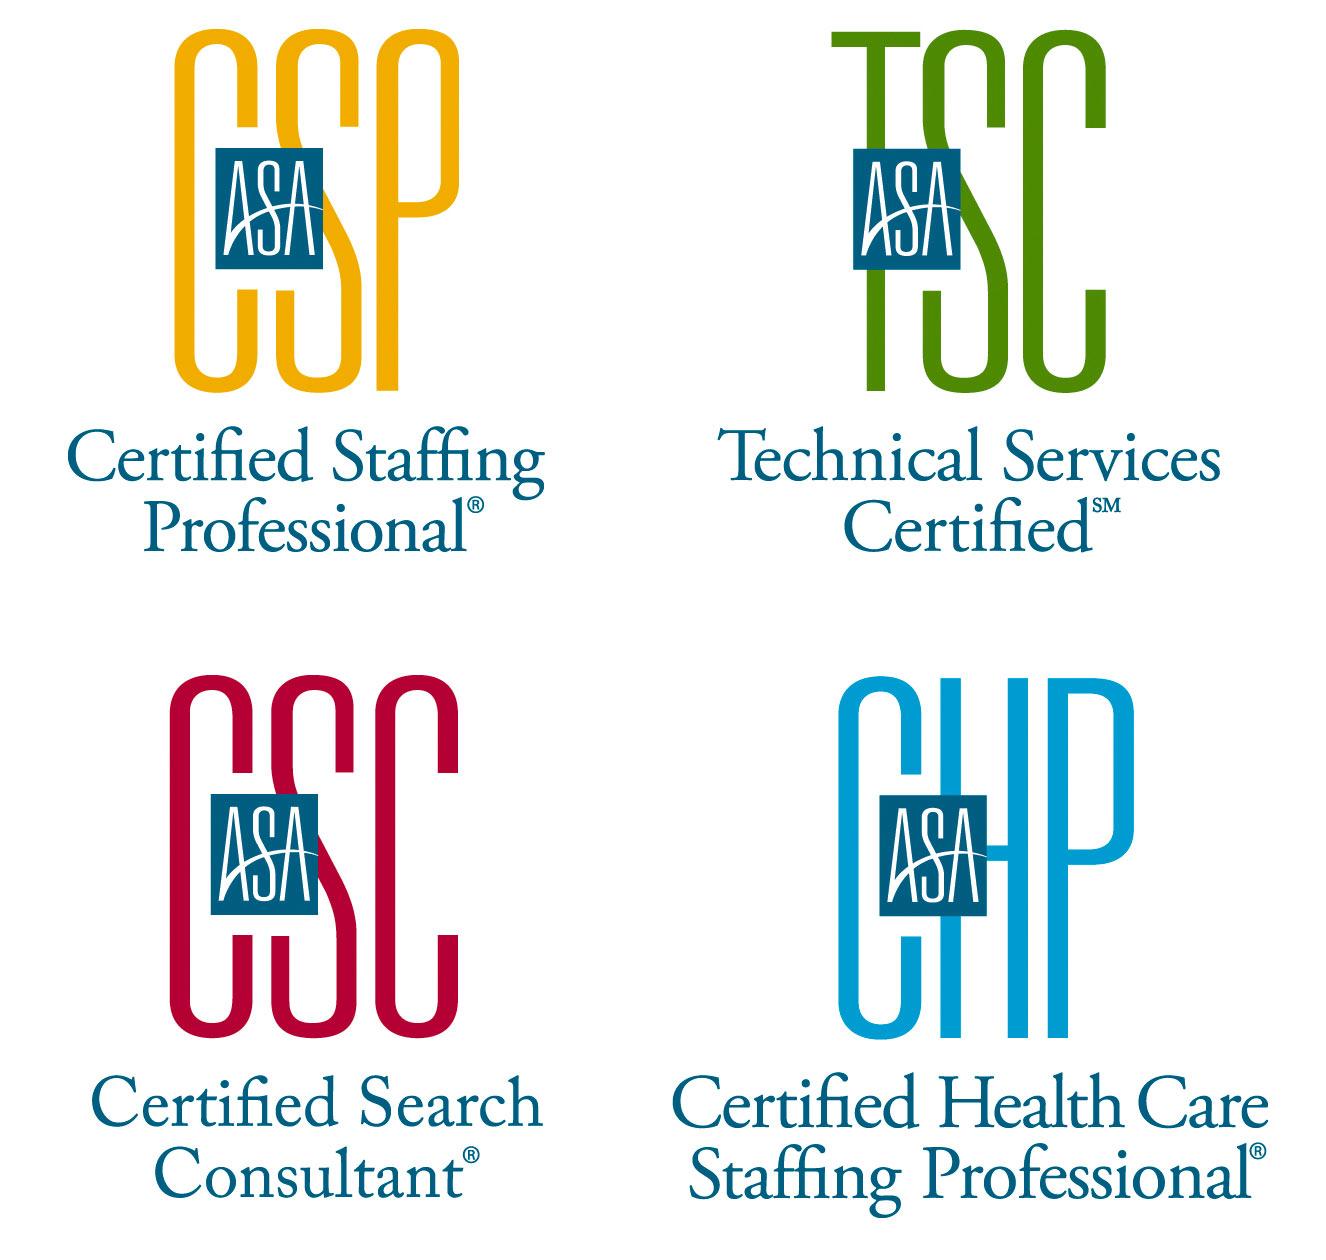 ASA Certification